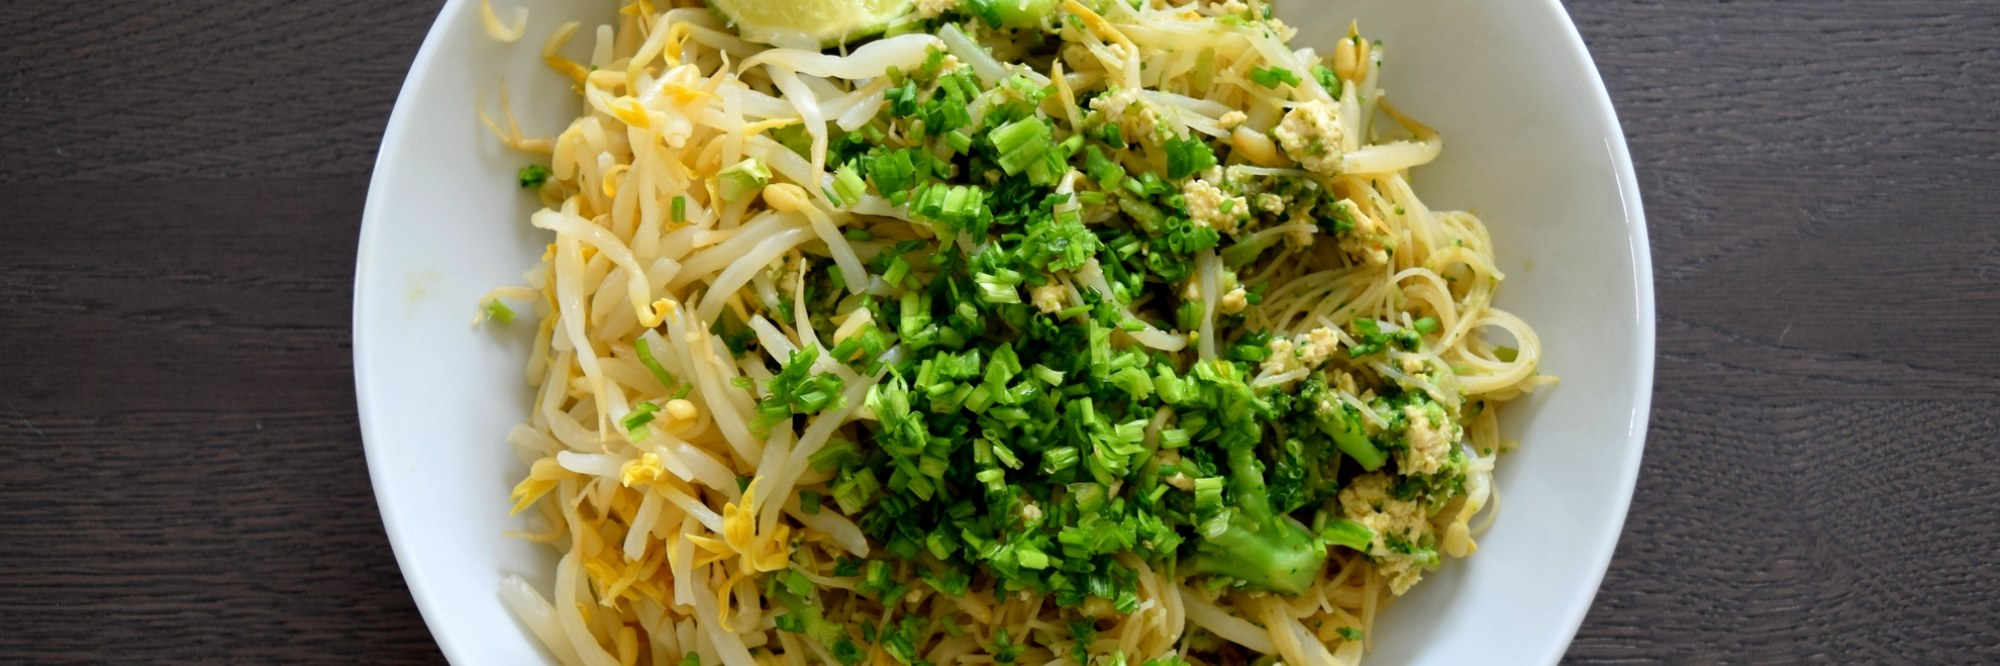 Pad thai brocoli Into The Green